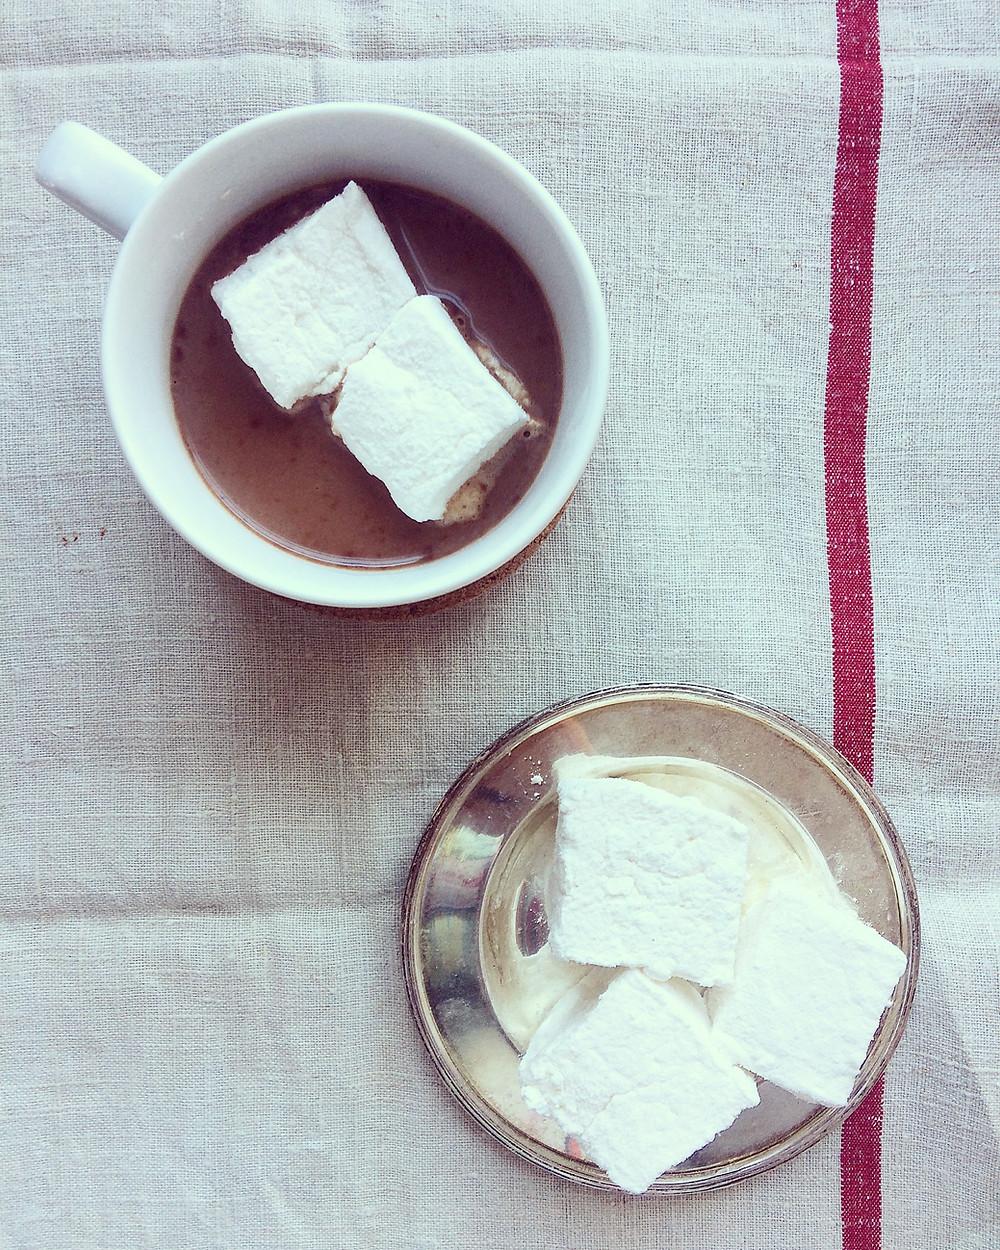 Hot Chocolate of Dreams - Sky Meadow Bakery blog